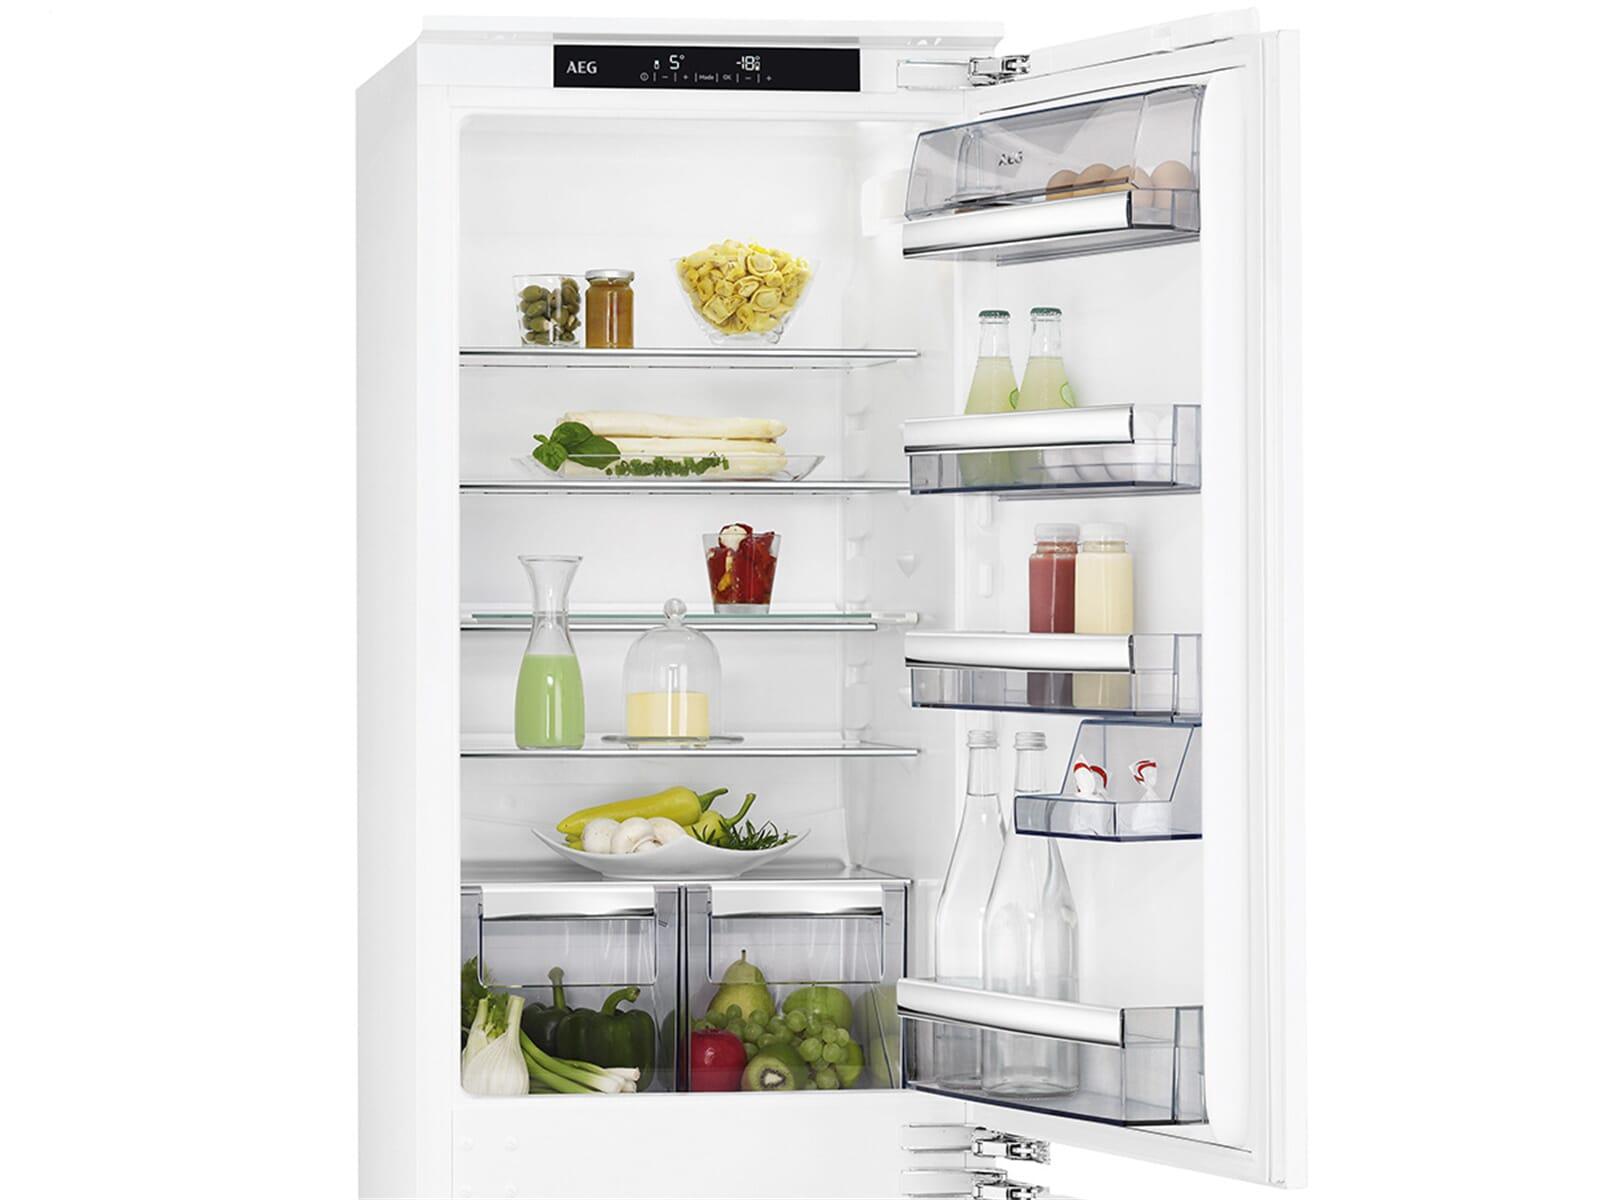 Aeg Kühlschrank Gefrierkombination : Aeg kühl und gefrierkombination aeg rcb nx santo edelstahl